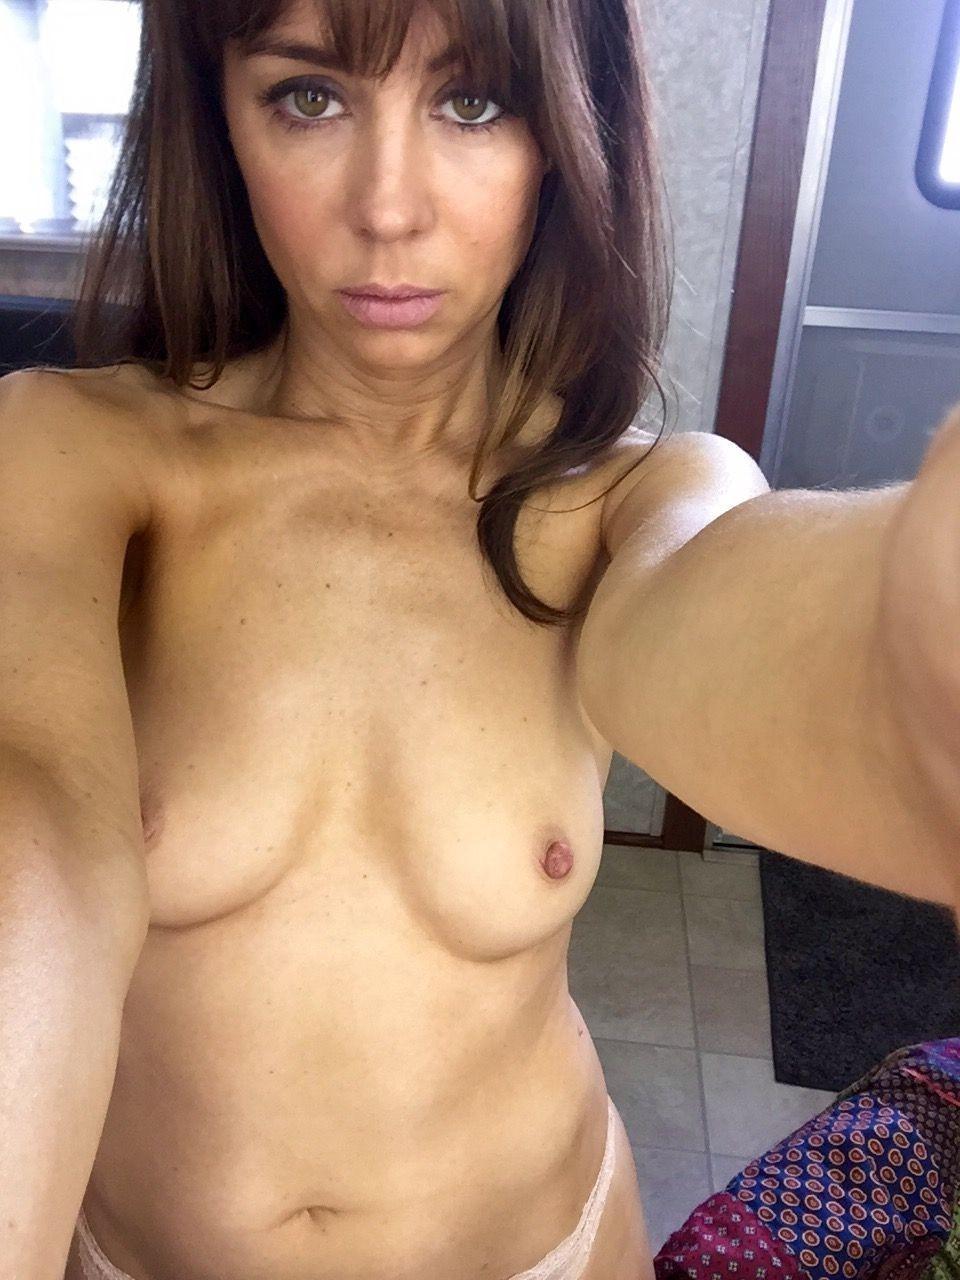 Natasha-Leggero-Nude-TheFappening-8.jpg